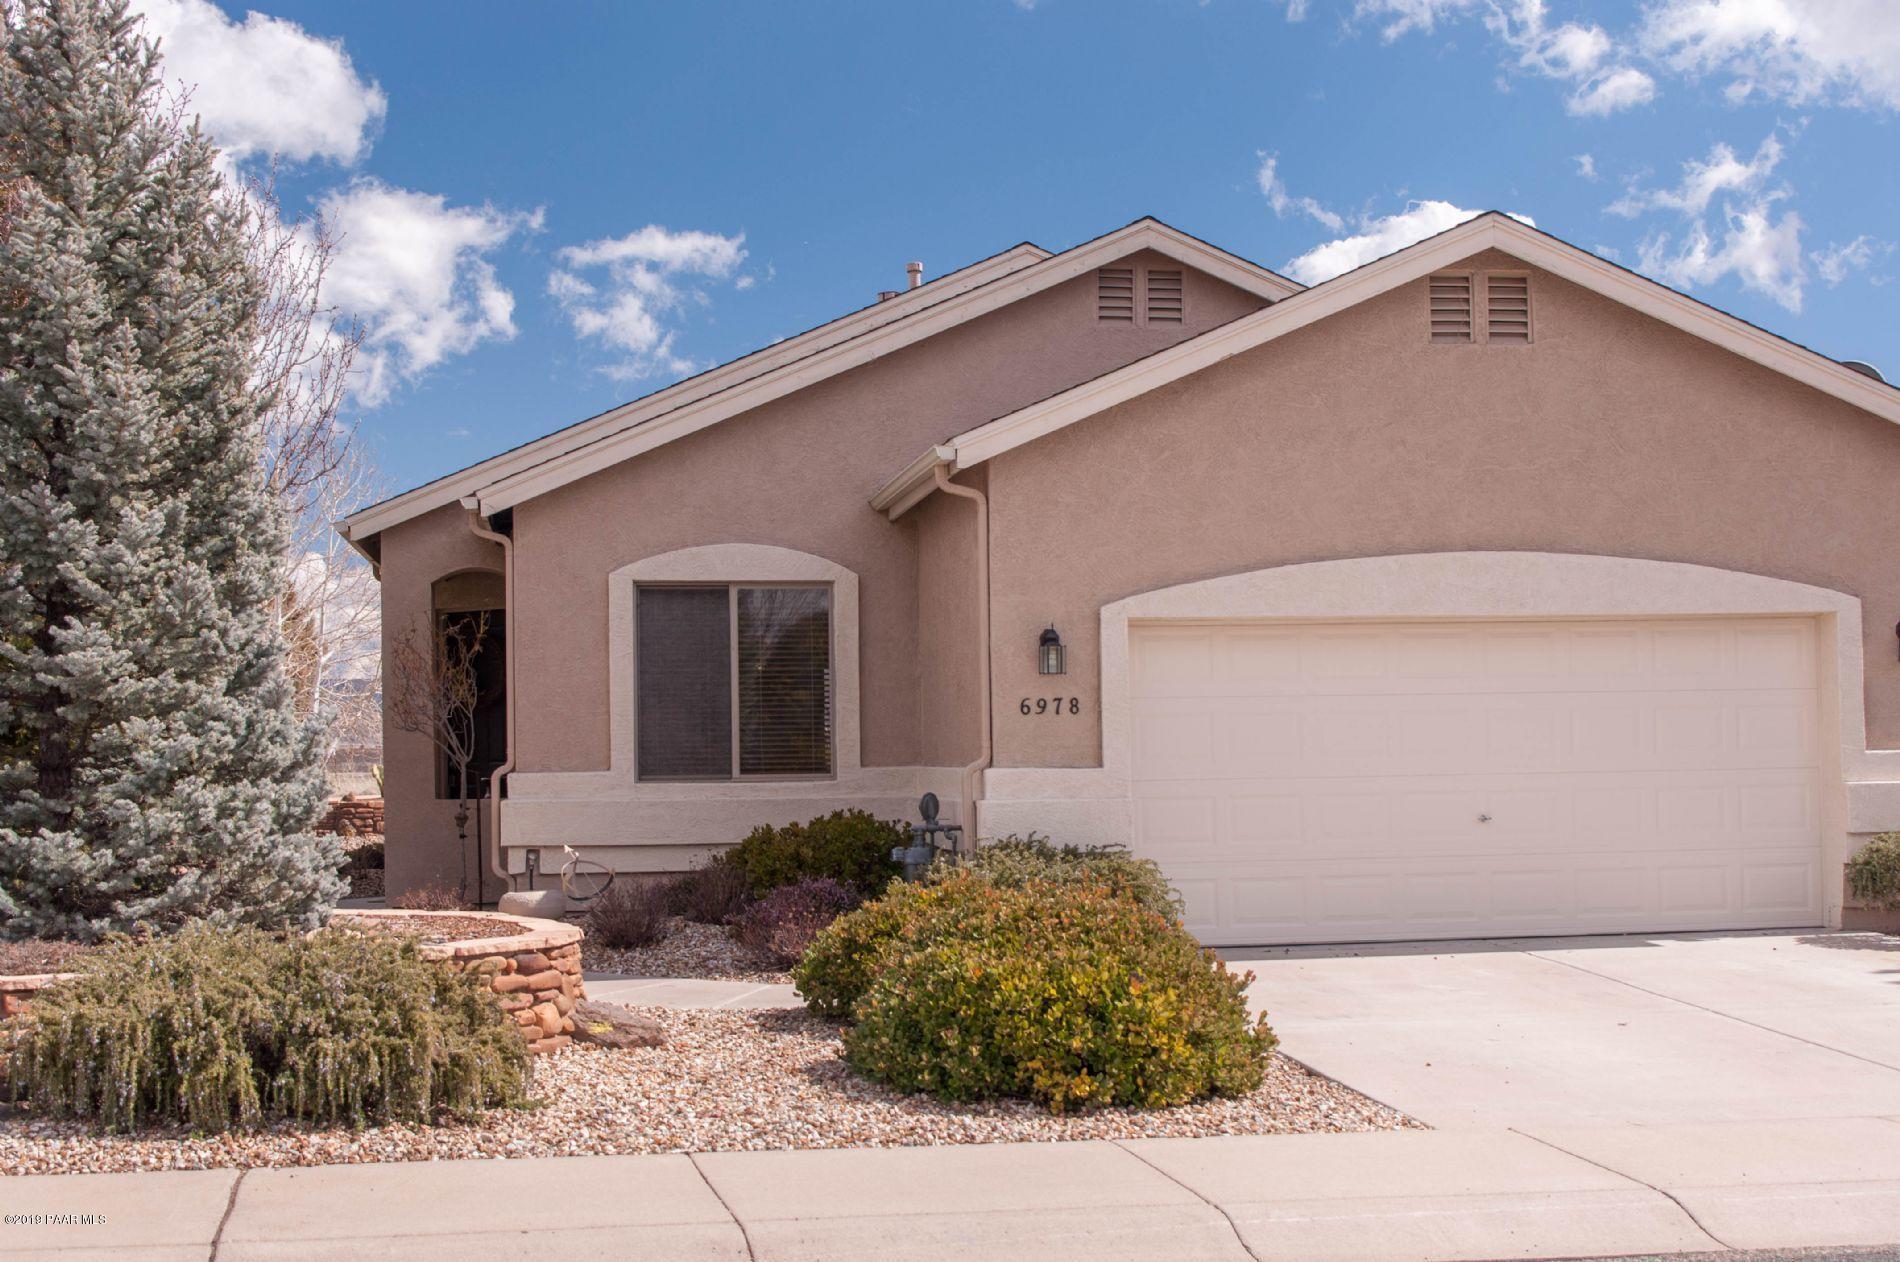 Photo of 6978 Yellowglen, Prescott Valley, AZ 86314